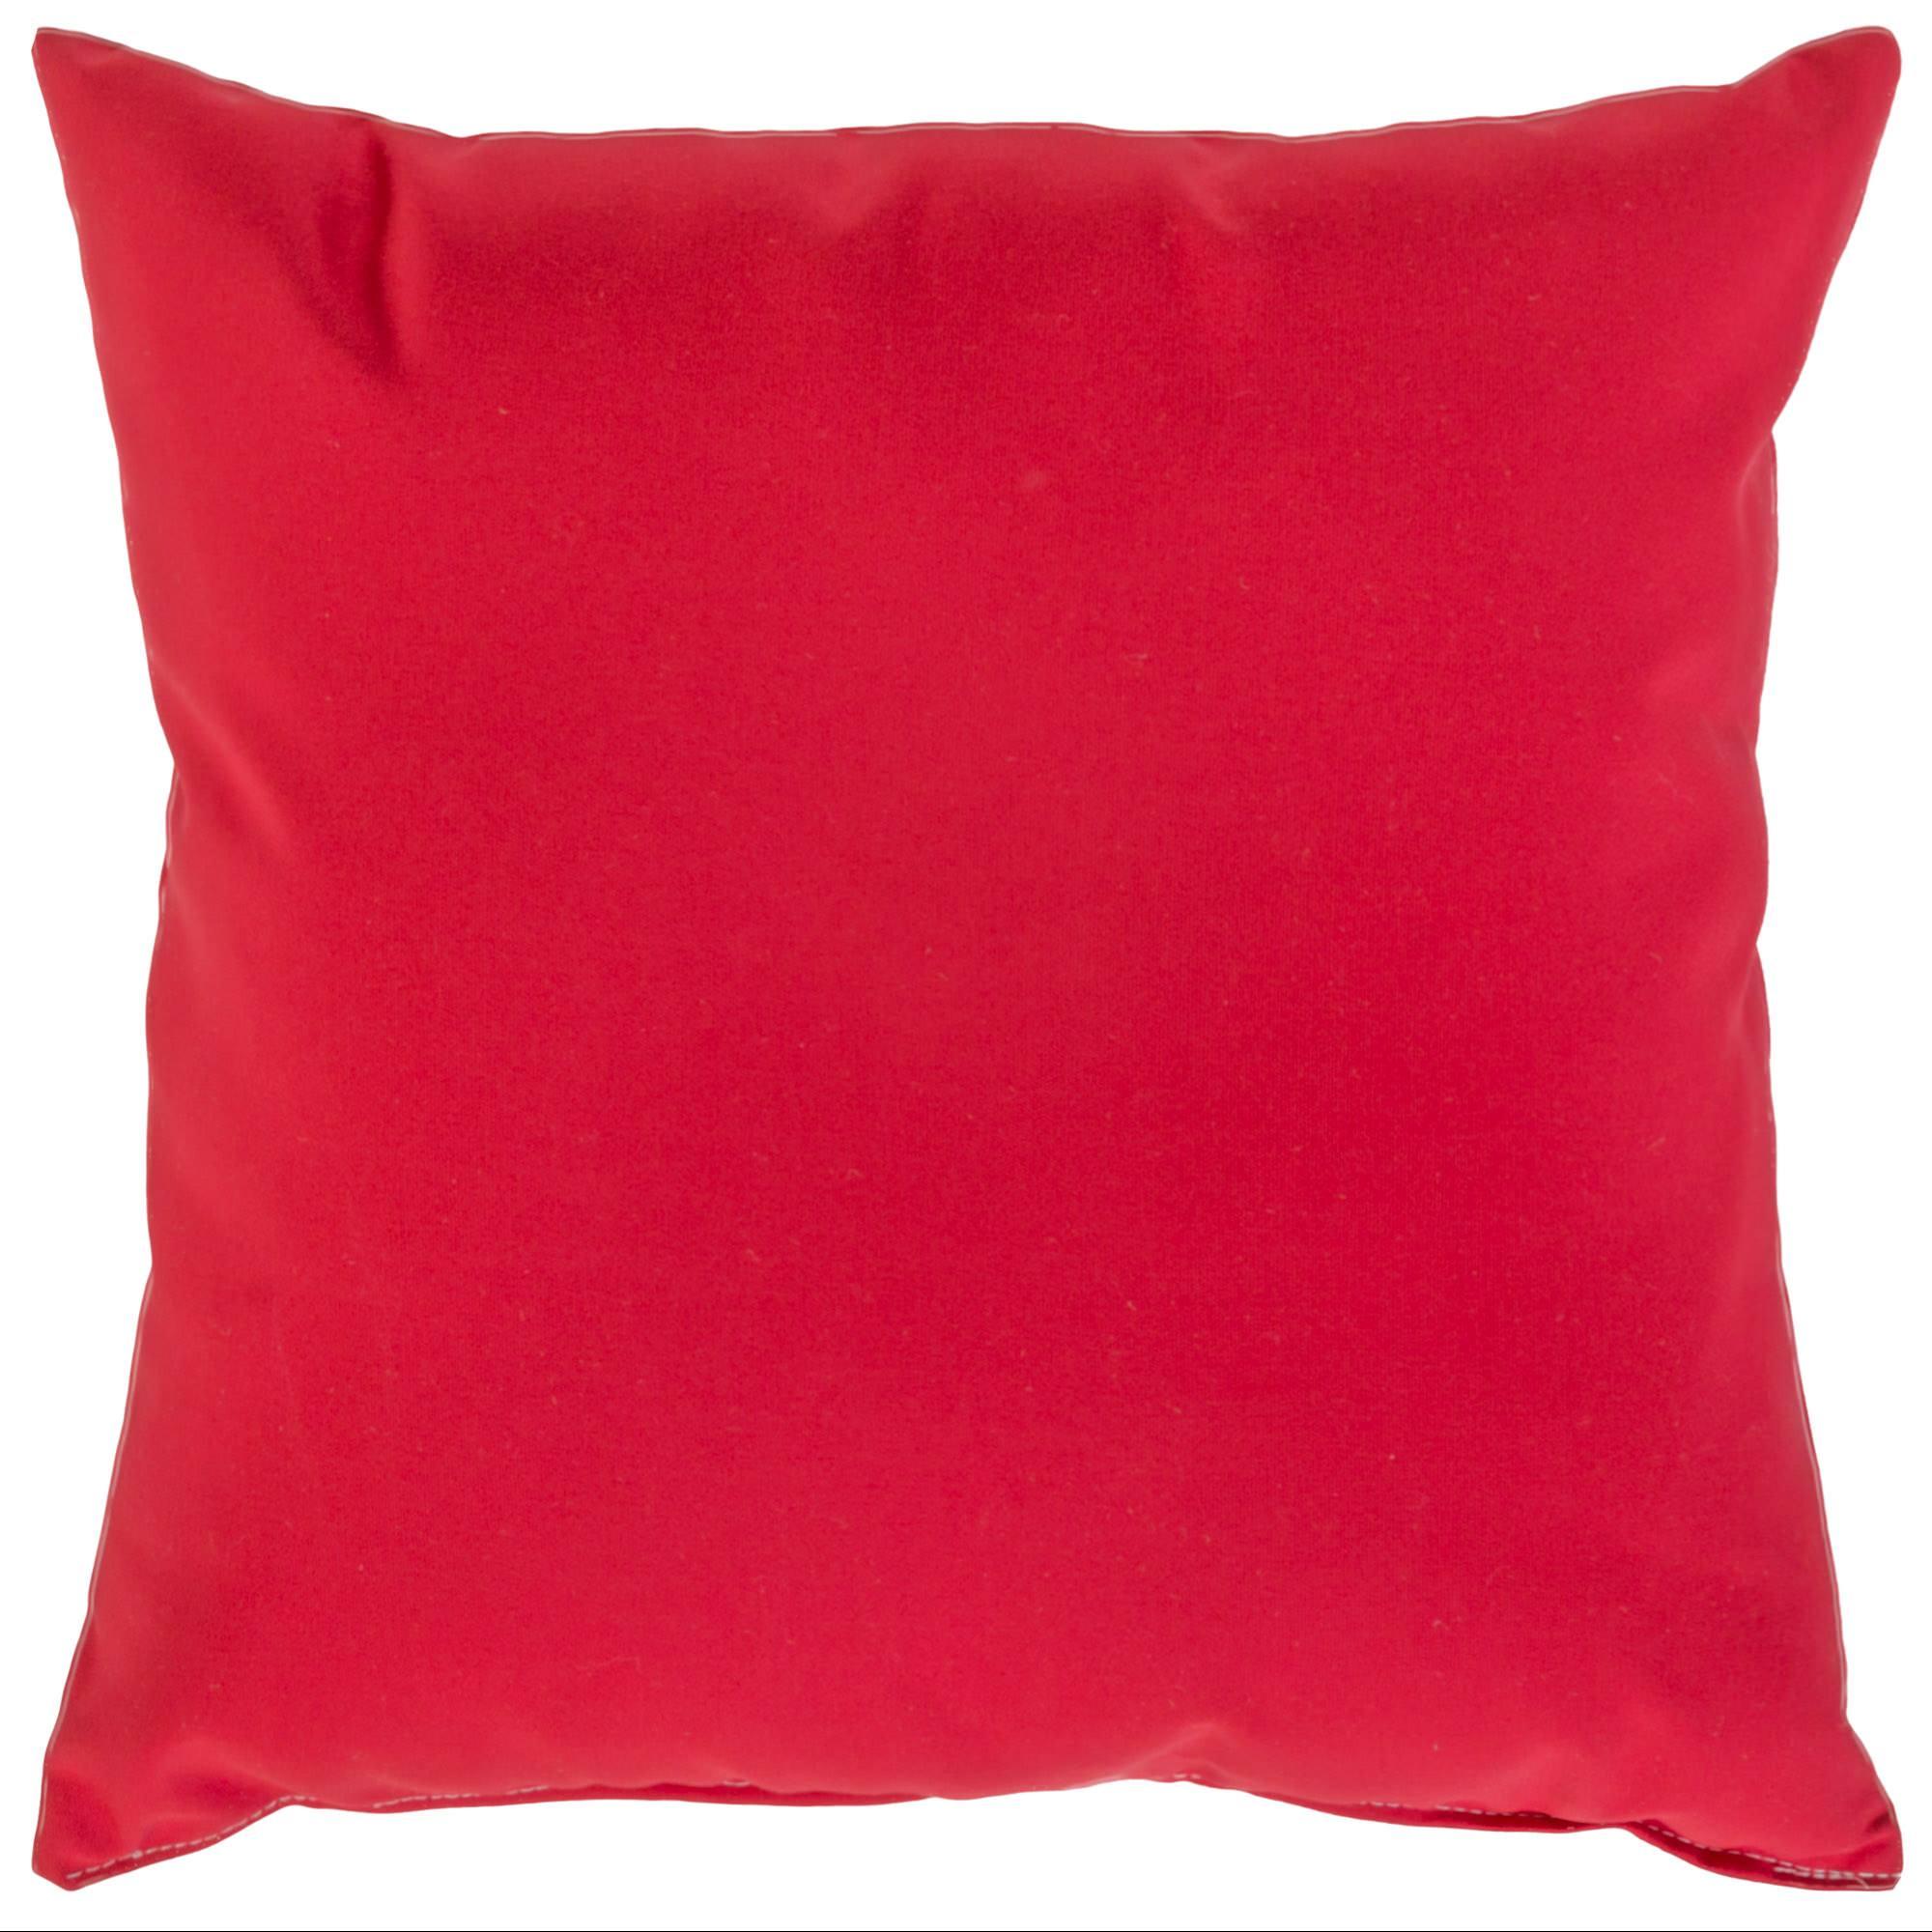 Jockey Red Sunbrella Outdoor Throw Pillow  DFOHome